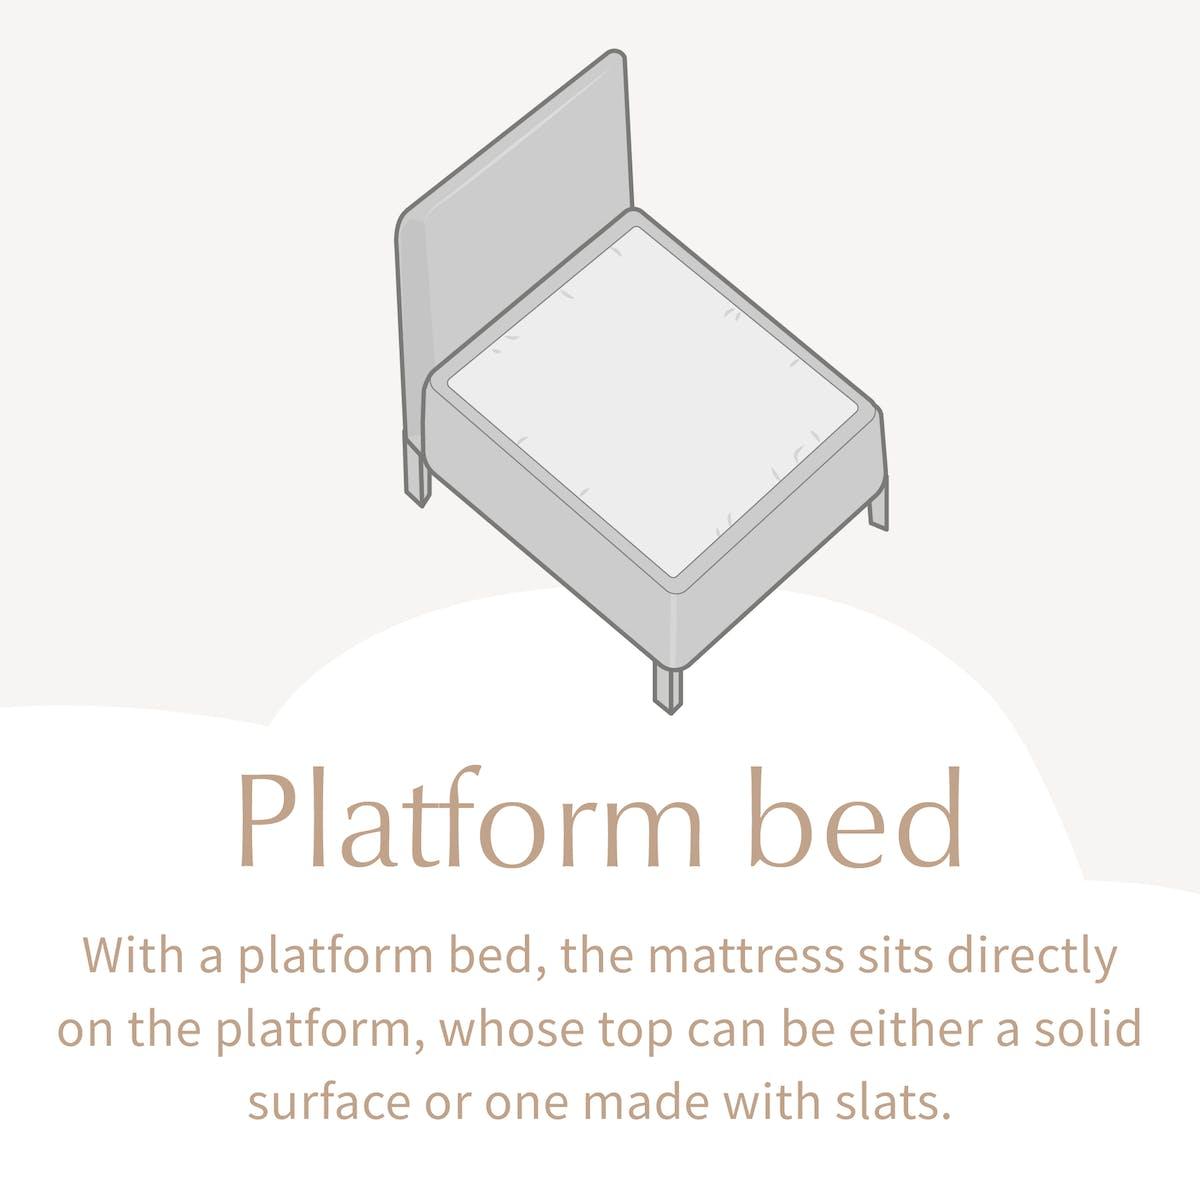 Illustration of platform bed with description underneath it: